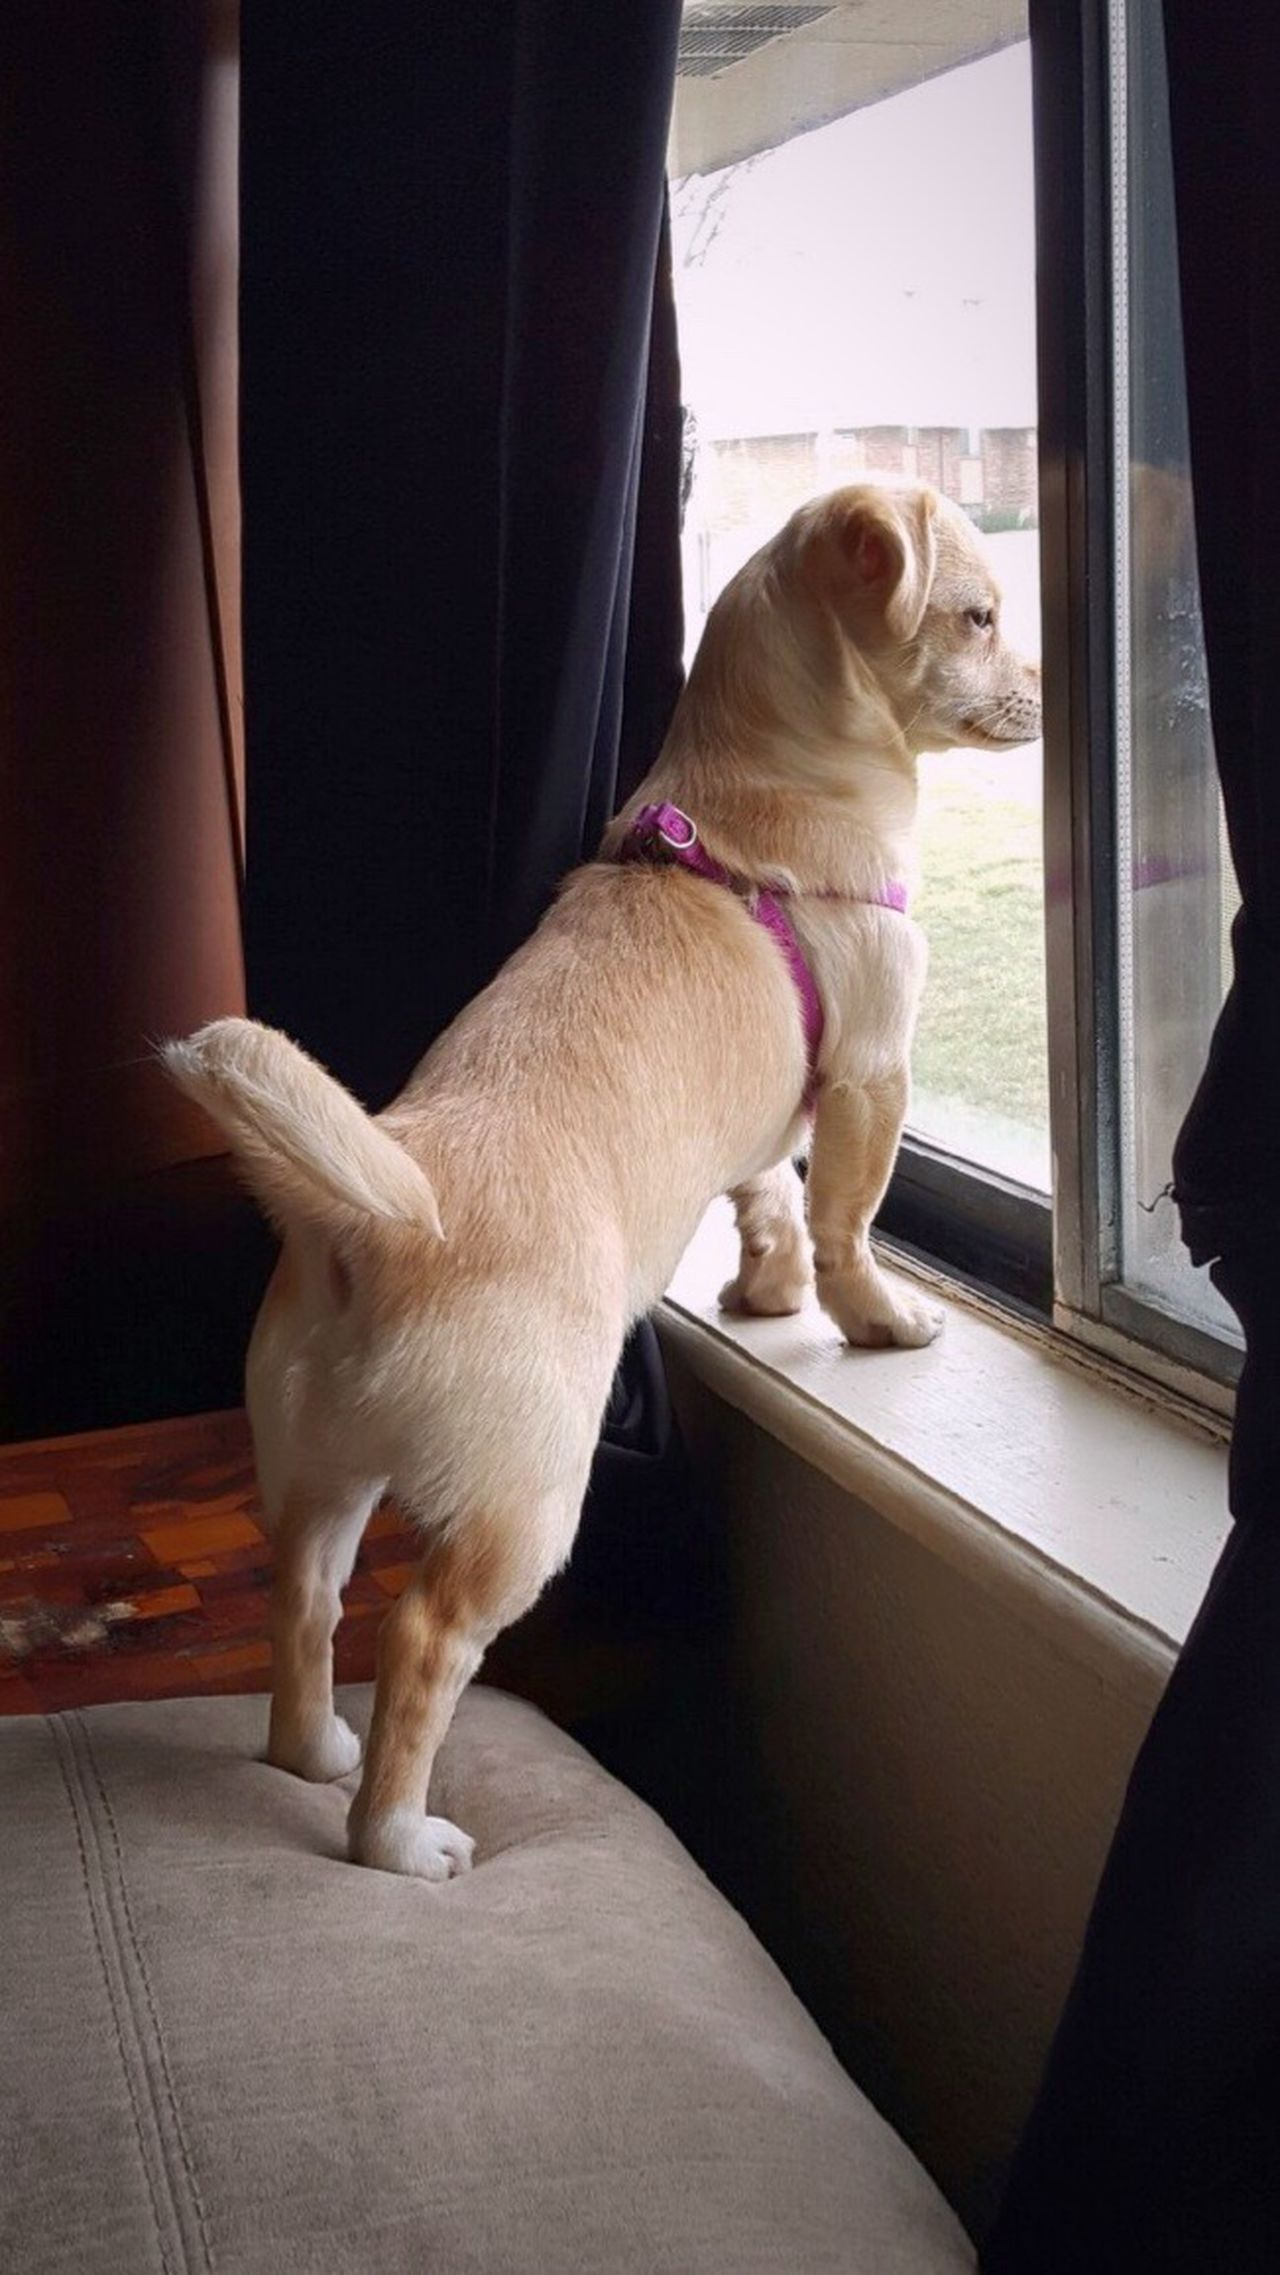 Pets Dog Domestic Animals Watch Dog Indoors  One Animal LuLu Good Dog